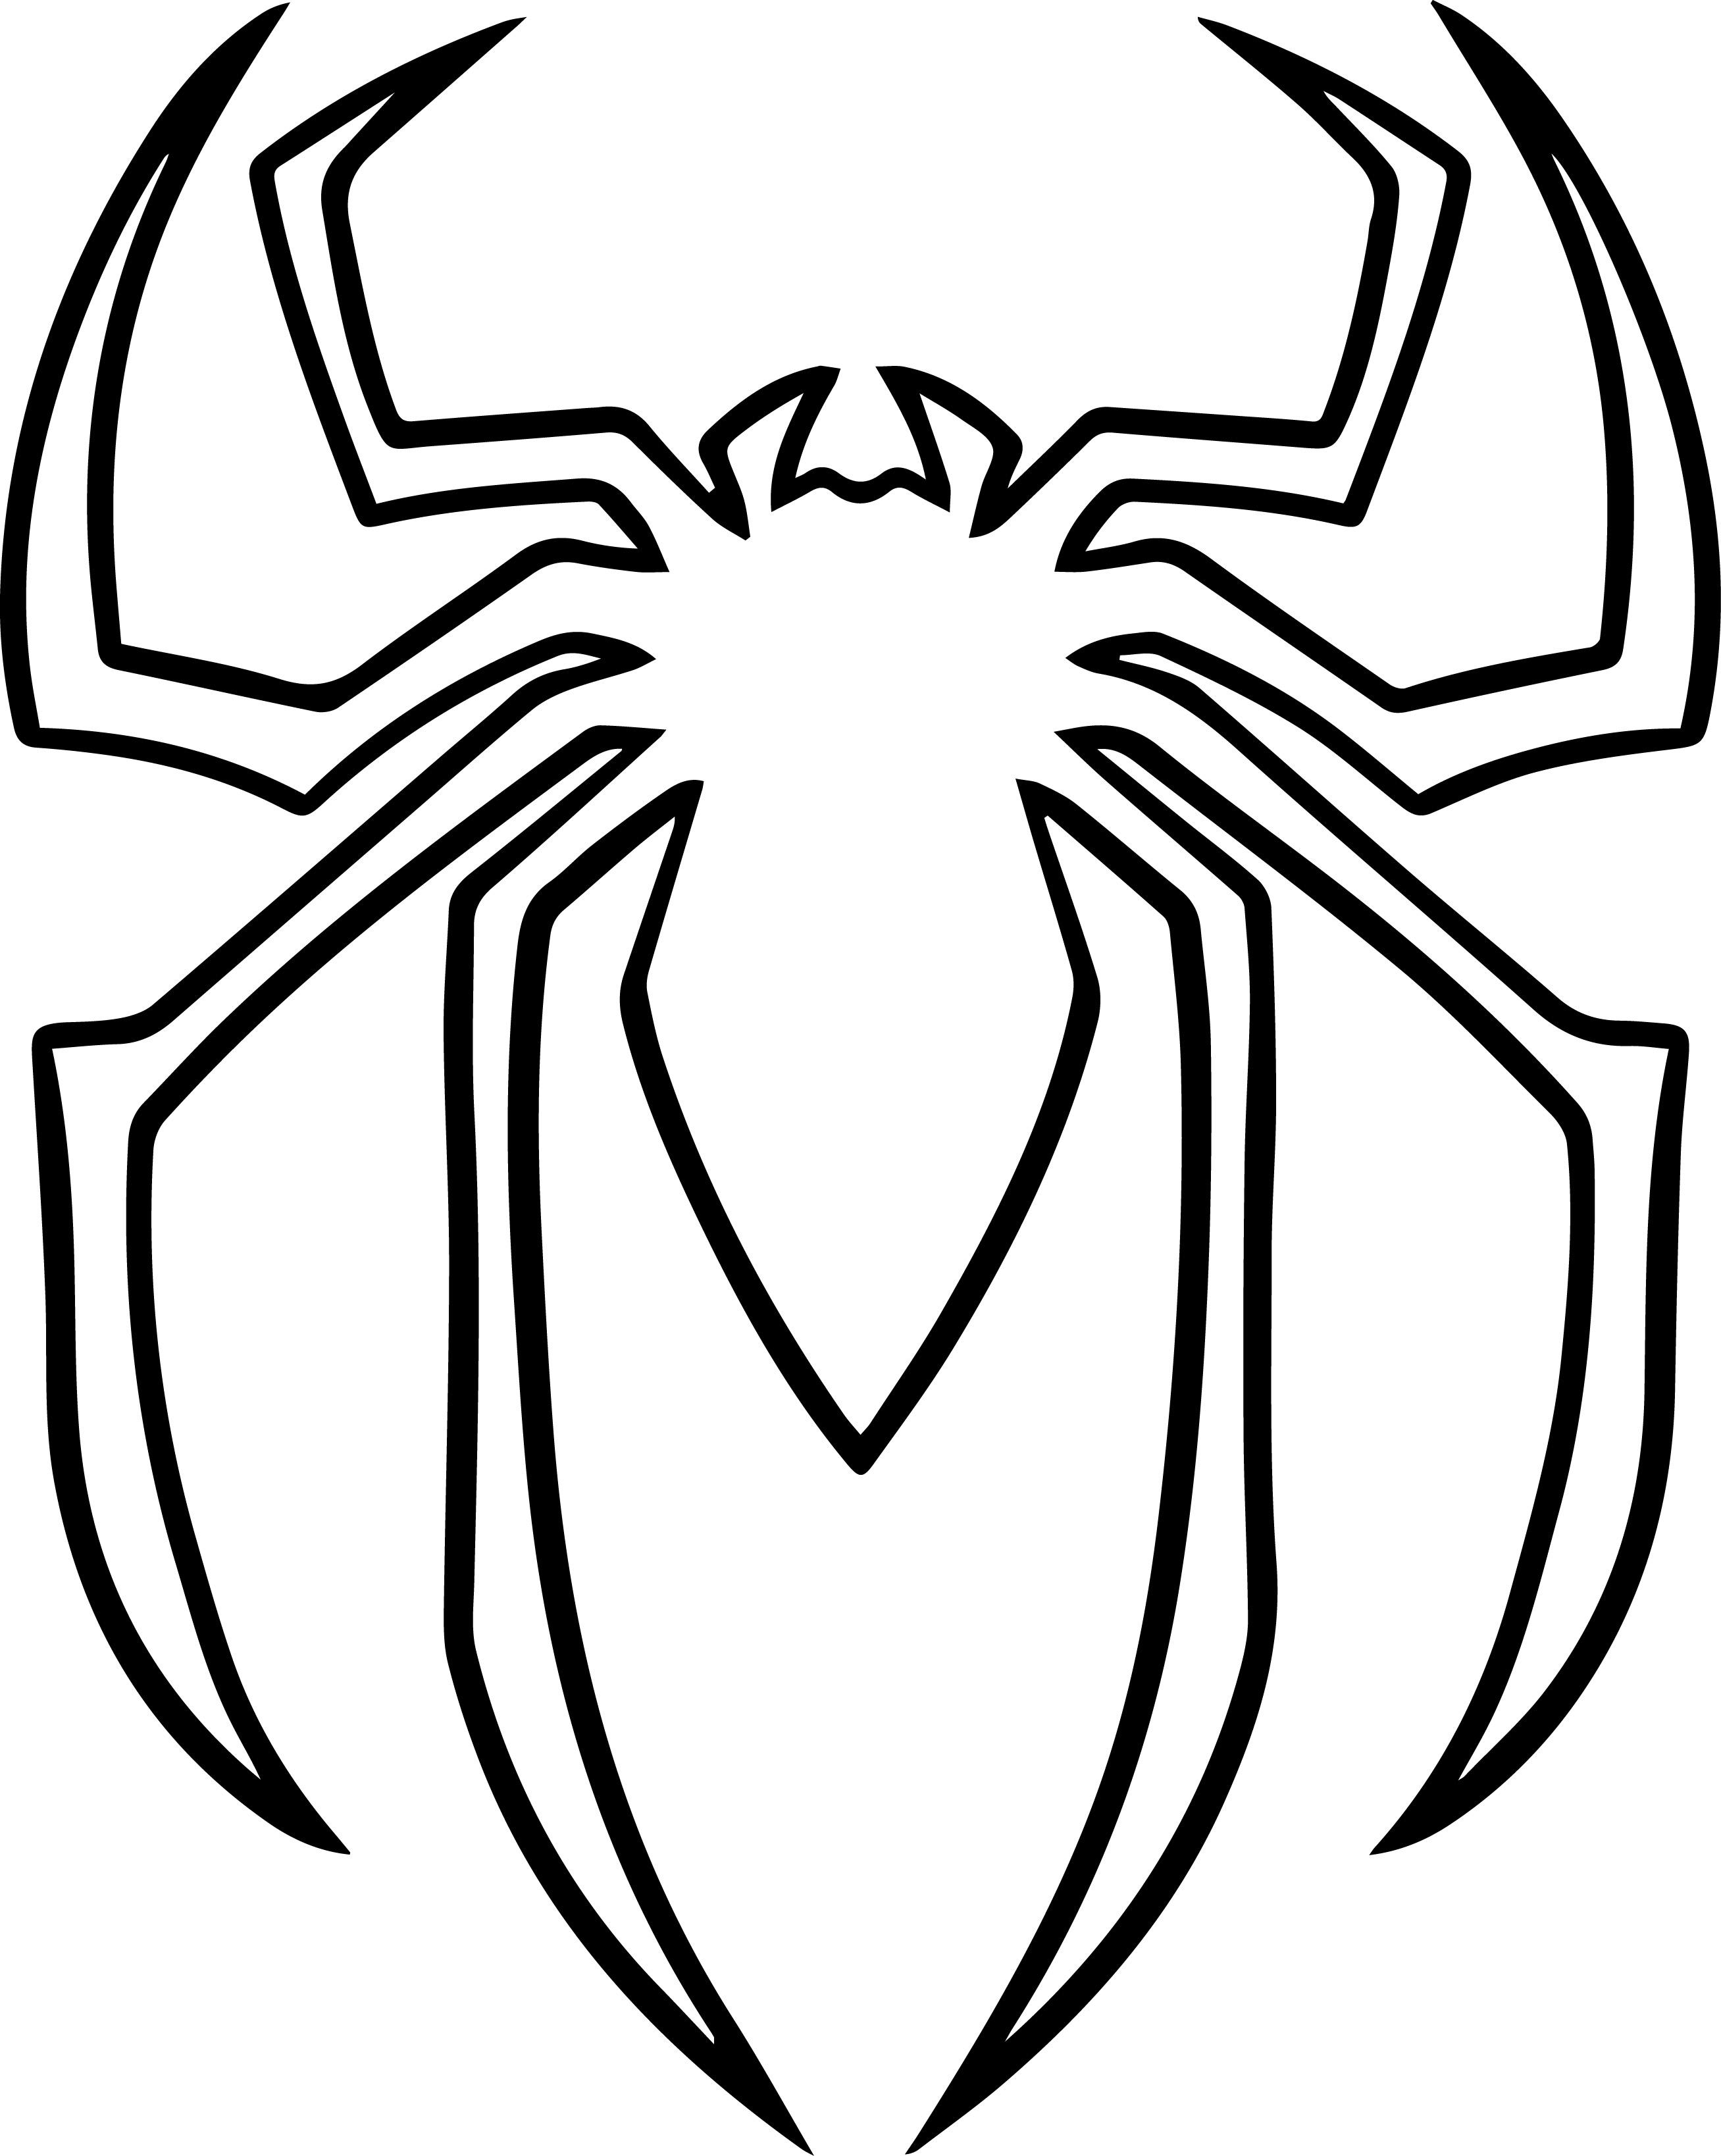 2615x3276 Deadpool Symbol Coloring Pages Best Famous Pictures